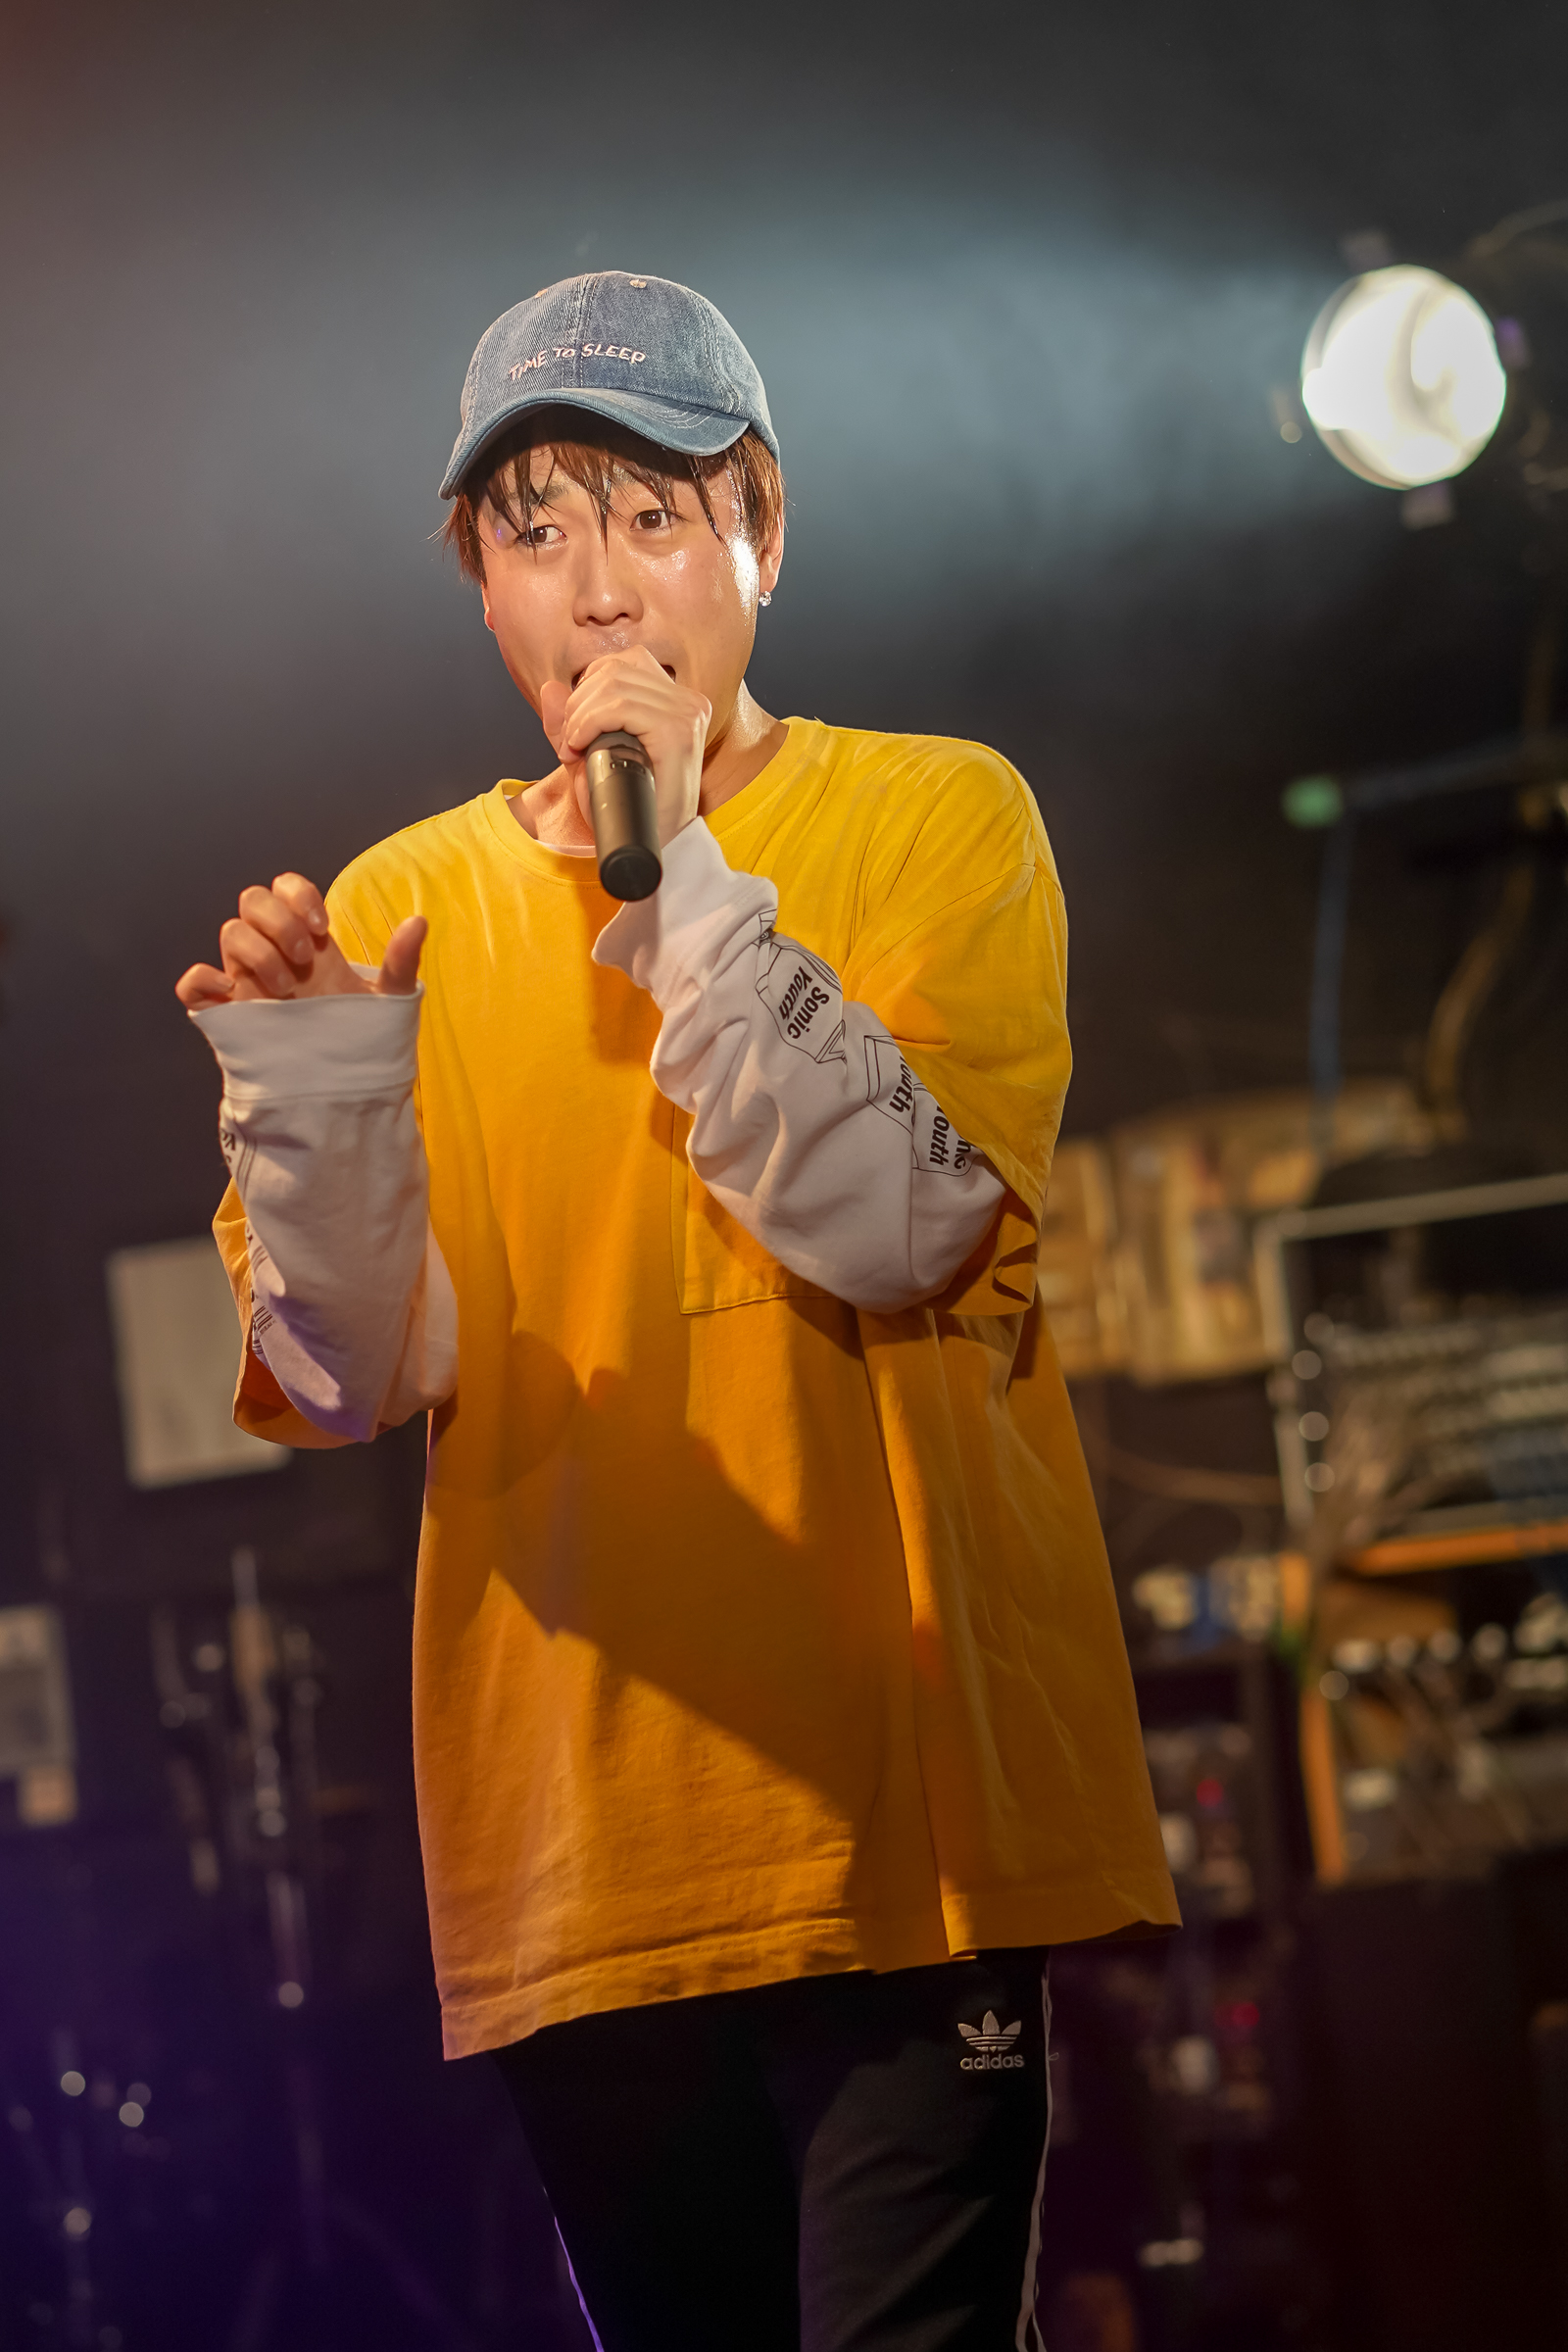 G.E.E.K RYO | ユニバーサル・ライブプロ・ジャパン2018